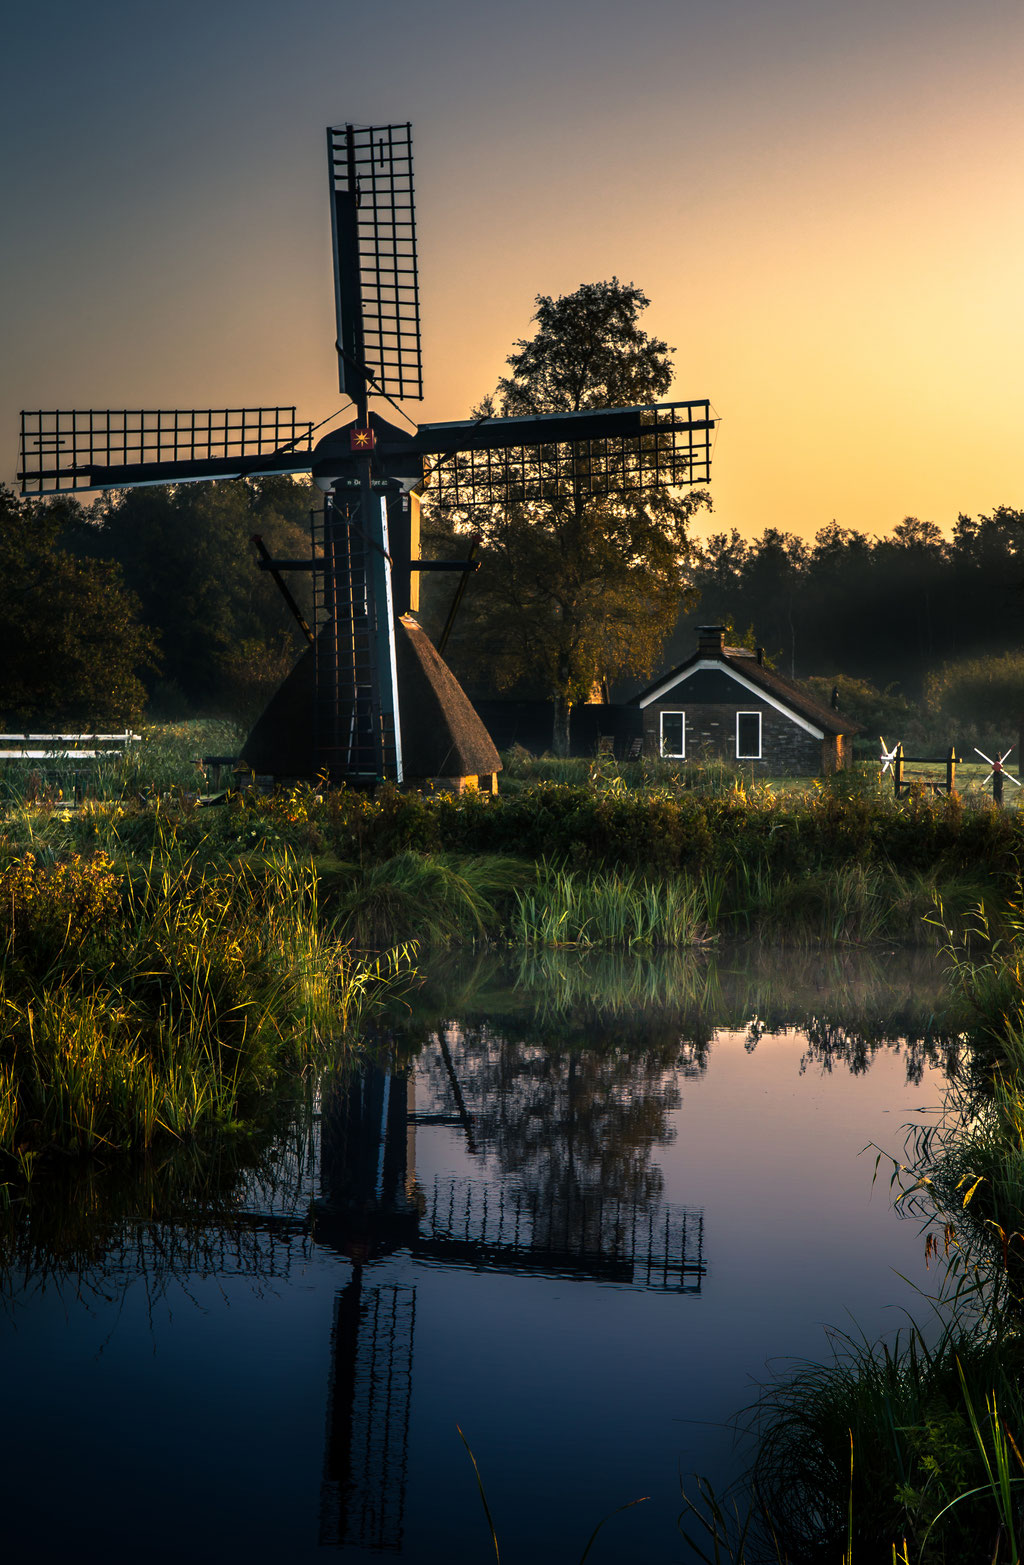 windmill 'de Wicher', Martijn van Steenbergen, © 2018